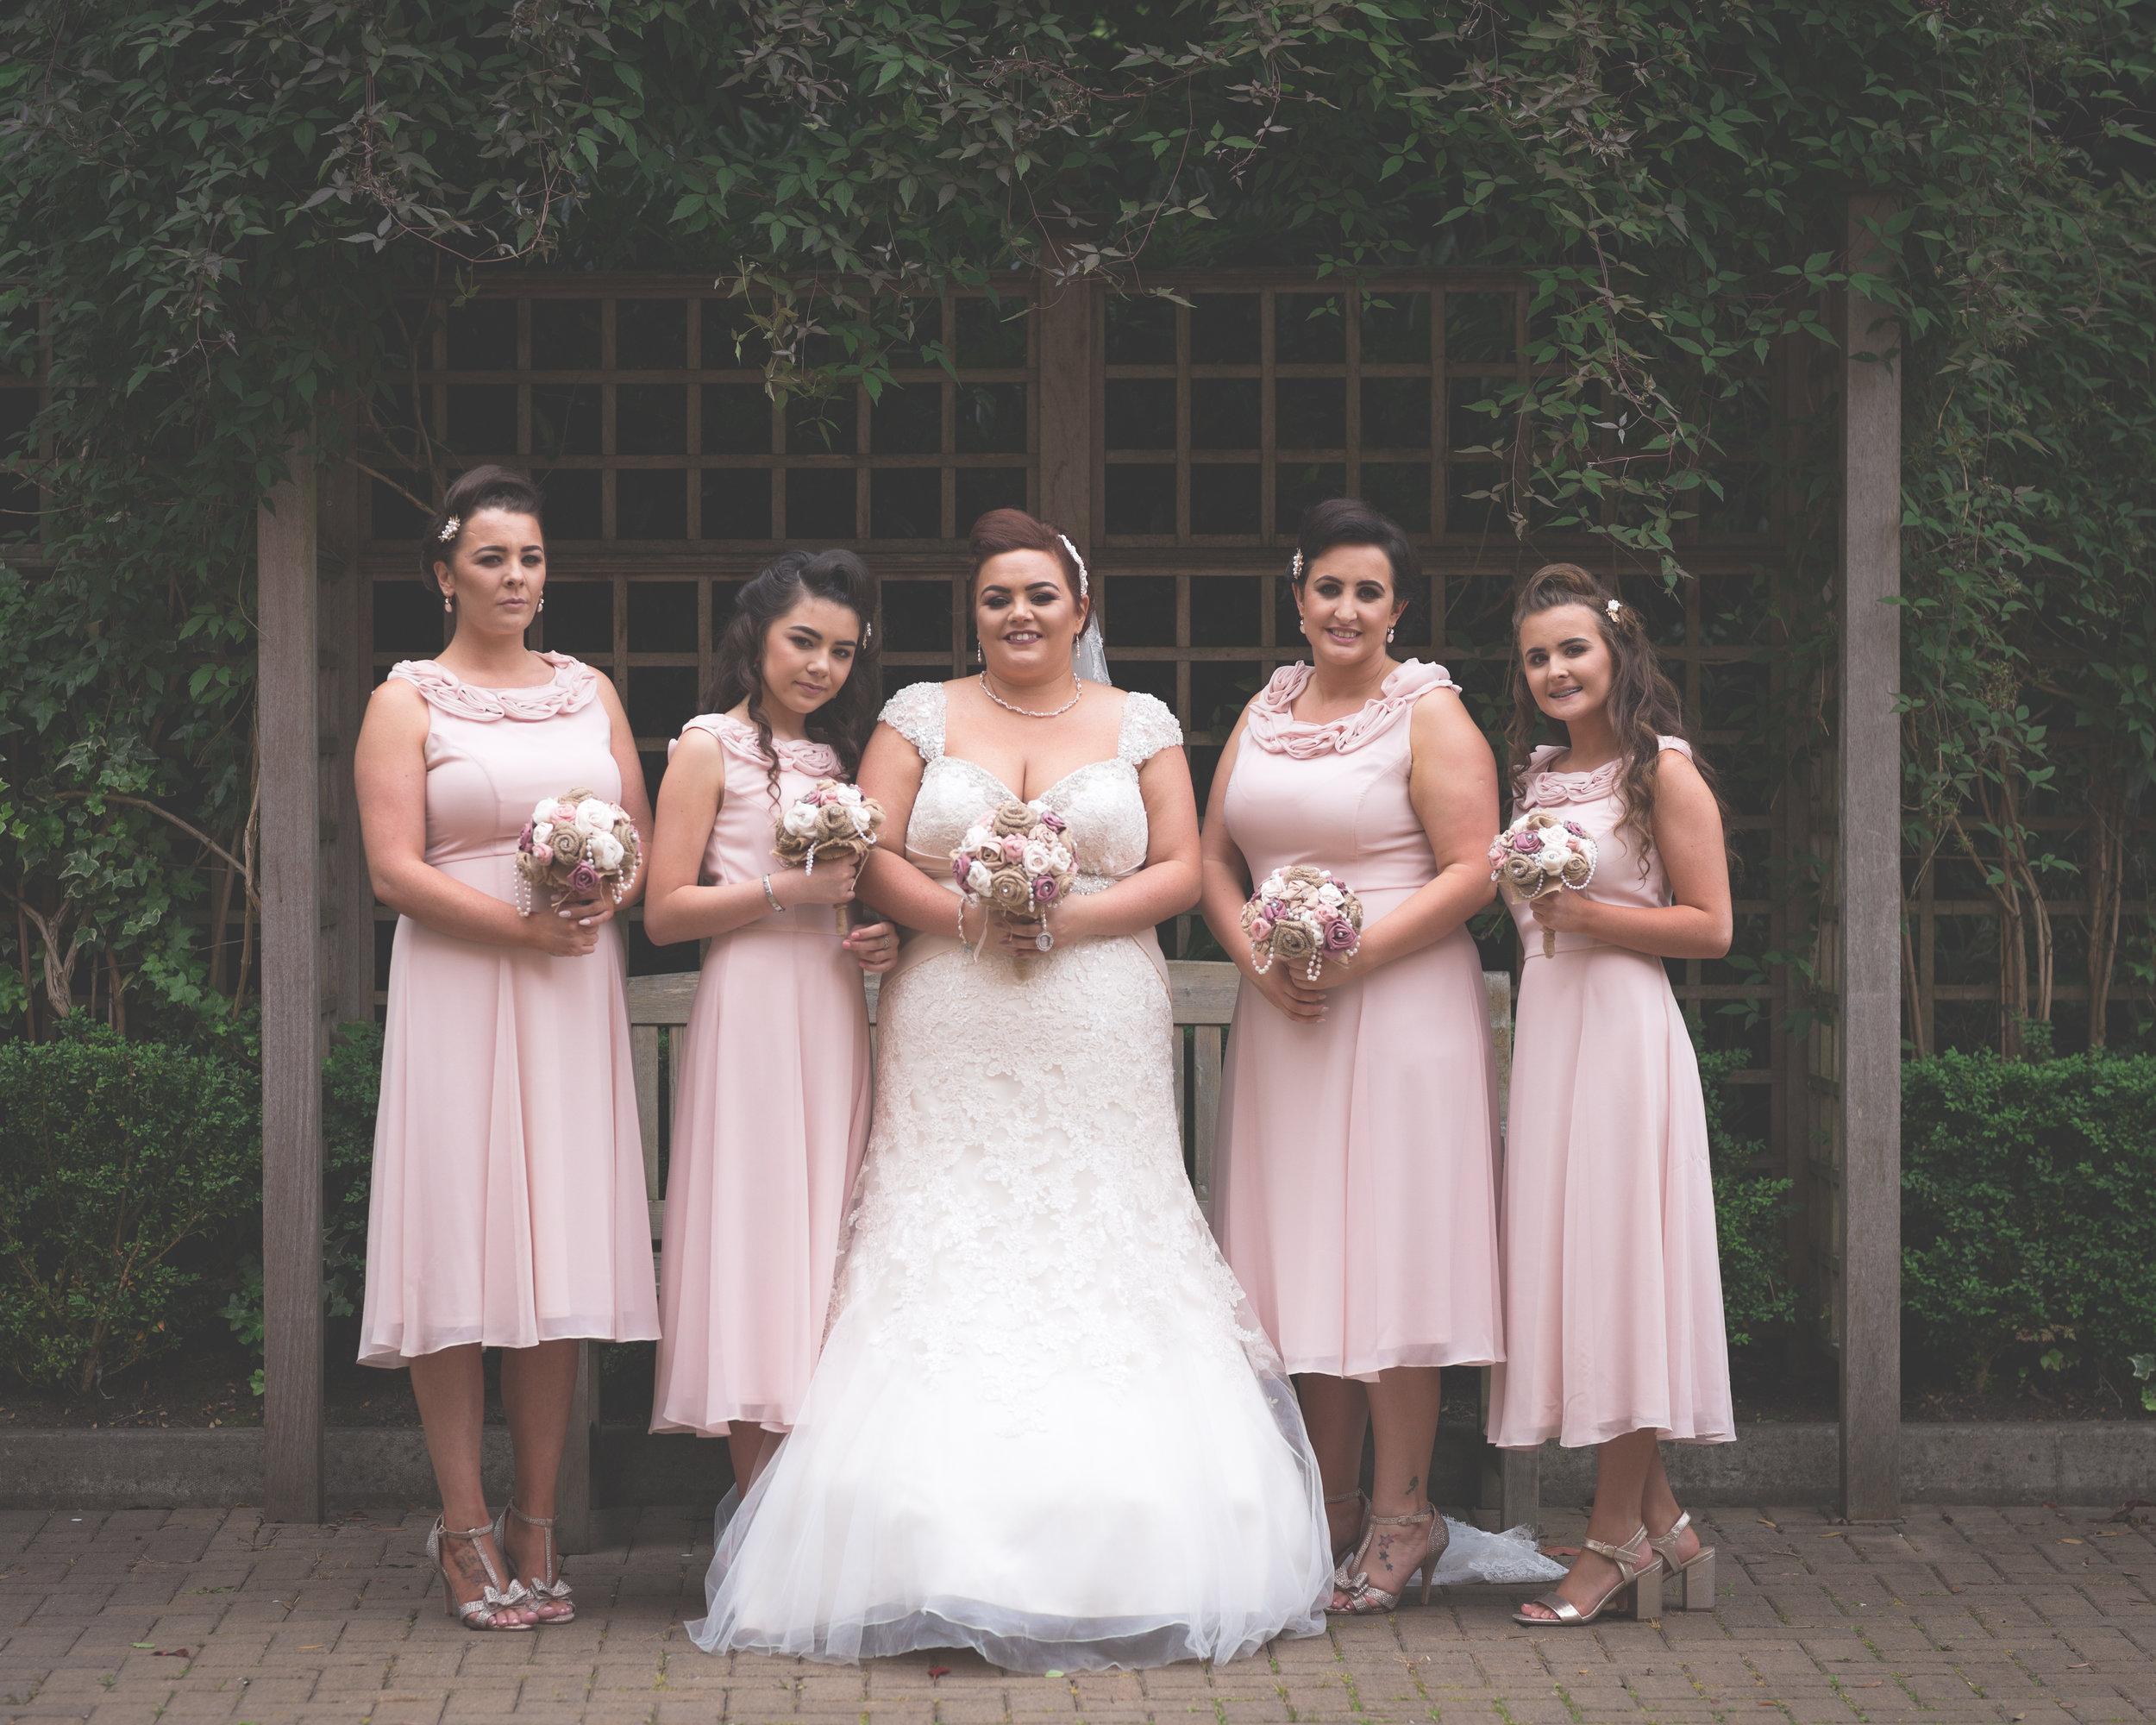 Antoinette & Stephen - Portraits   Brian McEwan Photography   Wedding Photographer Northern Ireland 62.jpg